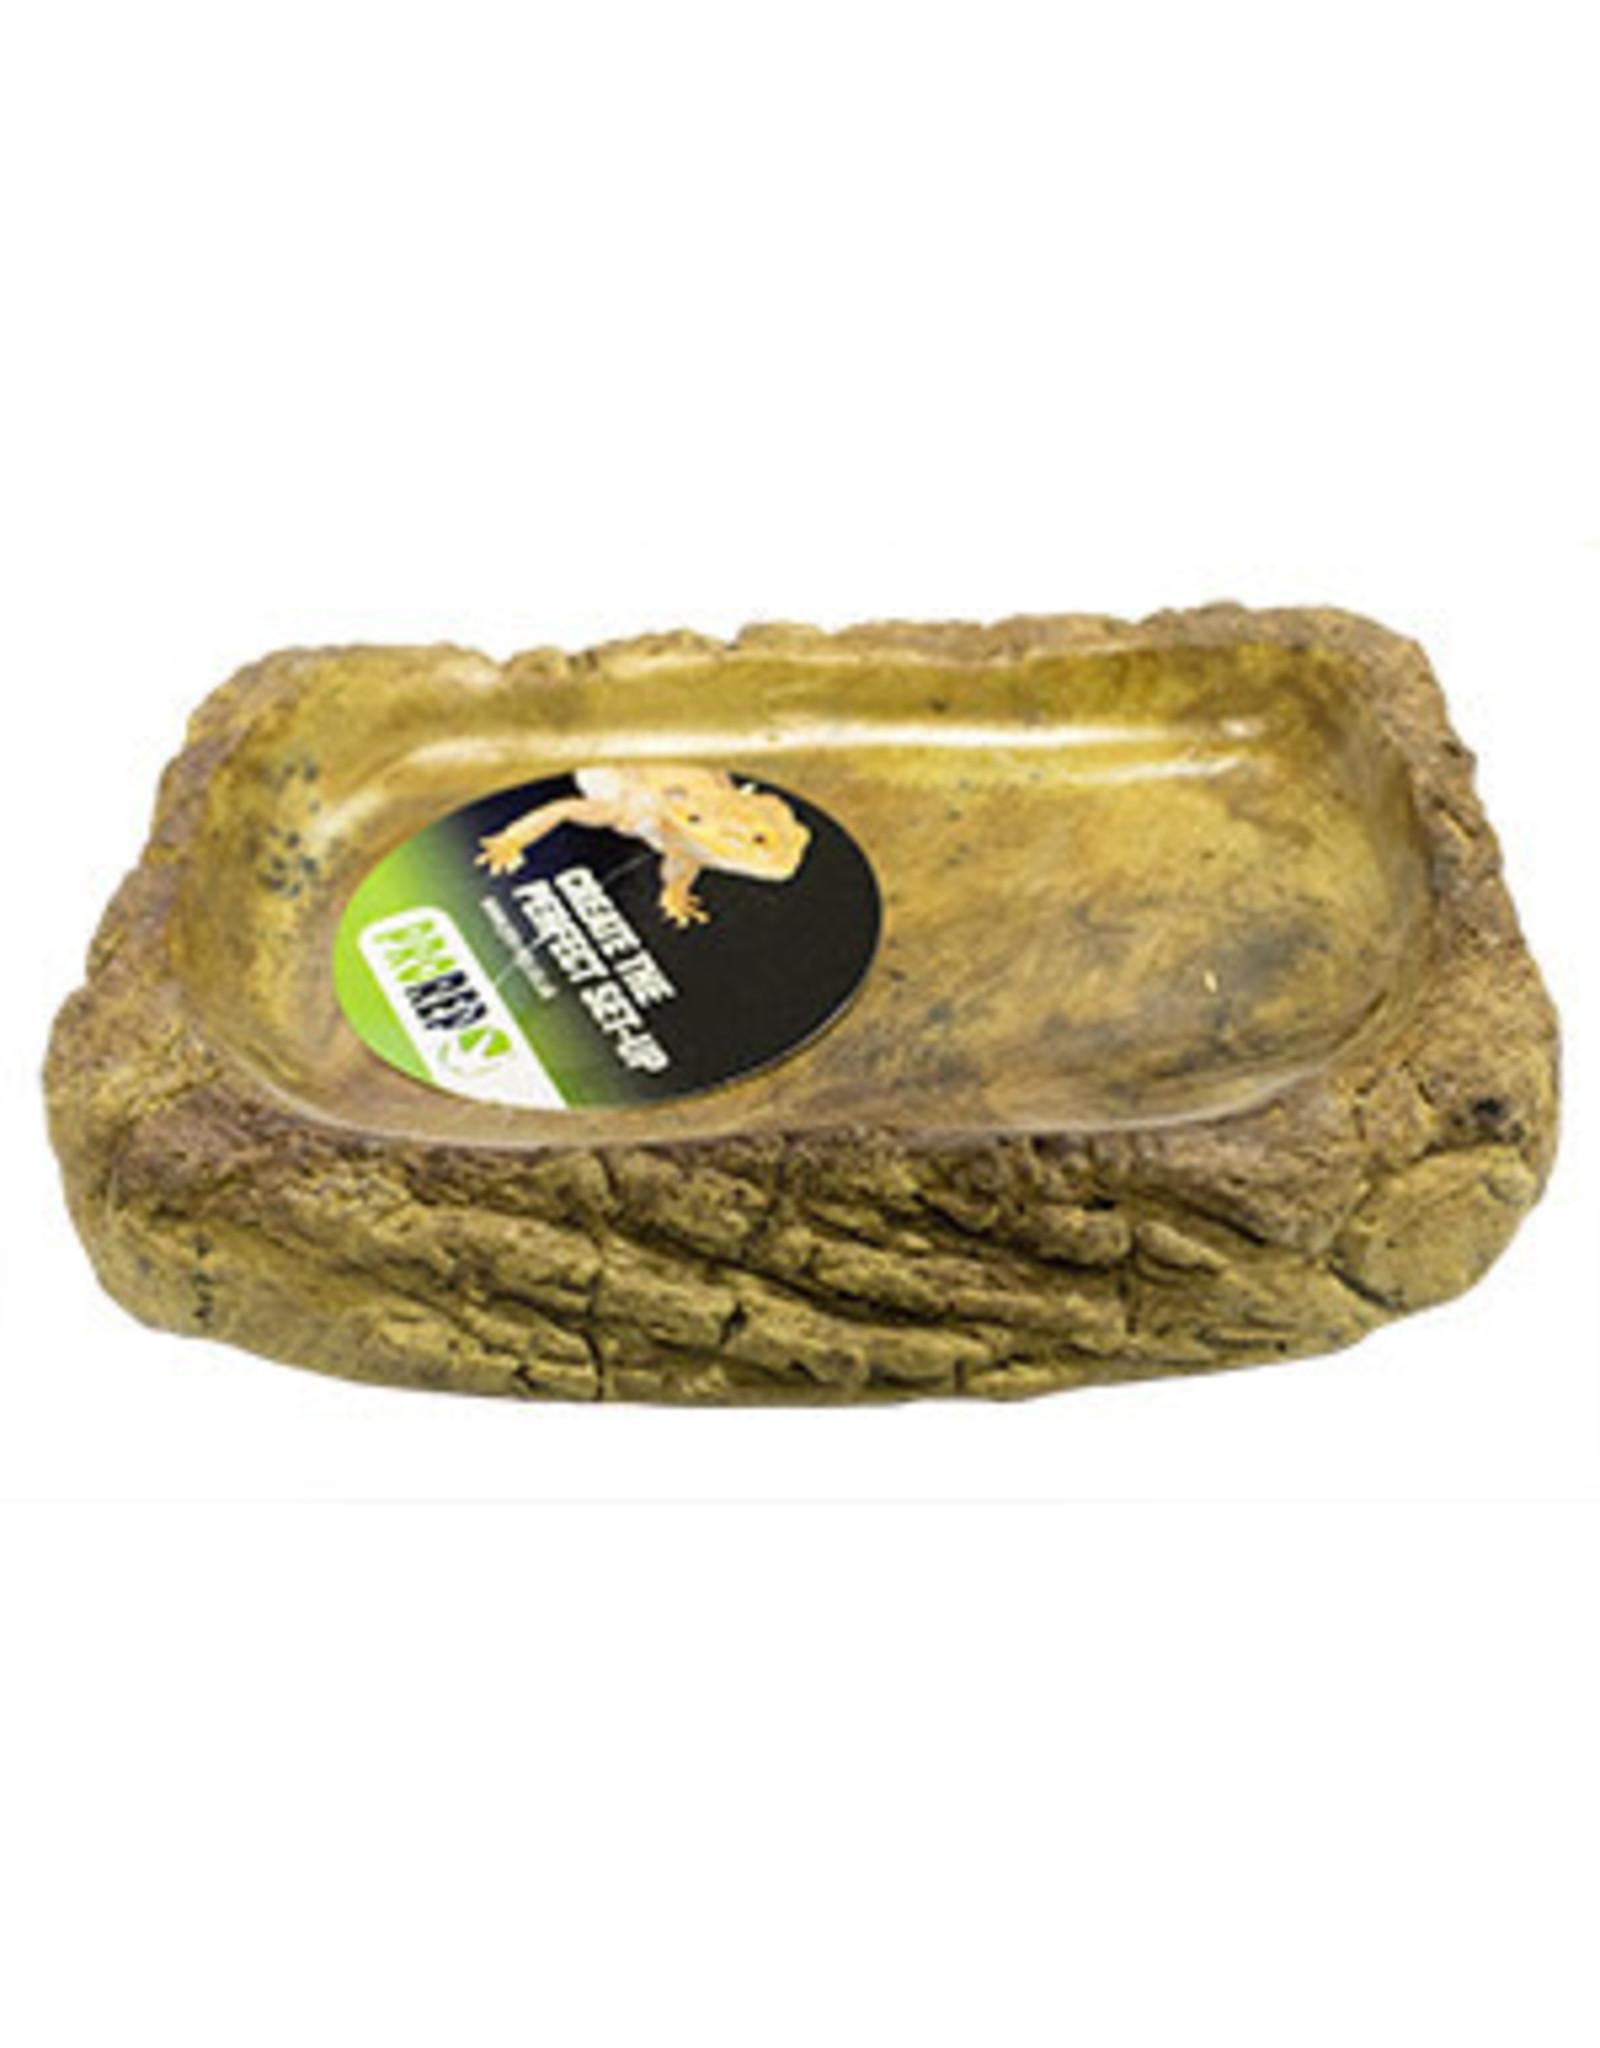 Pro Rep Tortoise Feeding Dish